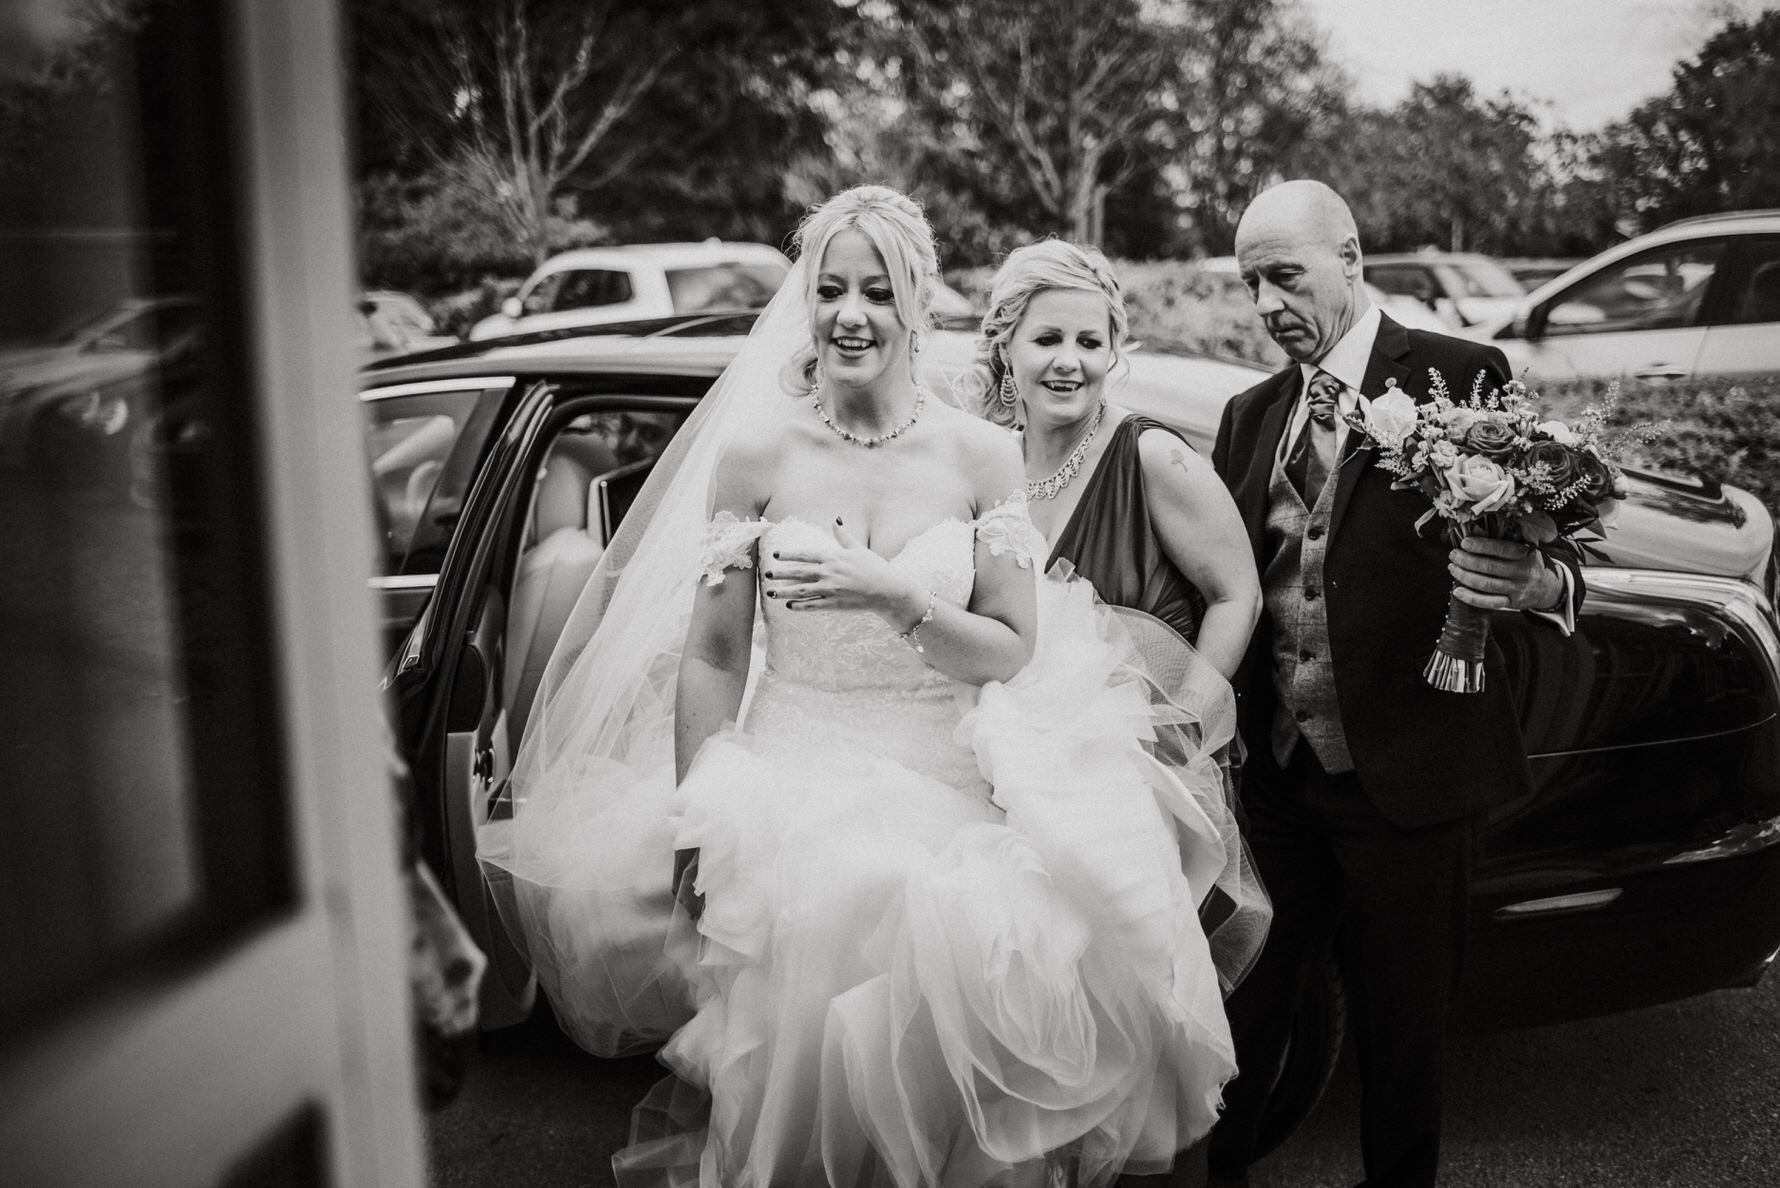 Cheshire Documentary Wedding Photography at The Stone House Hotel